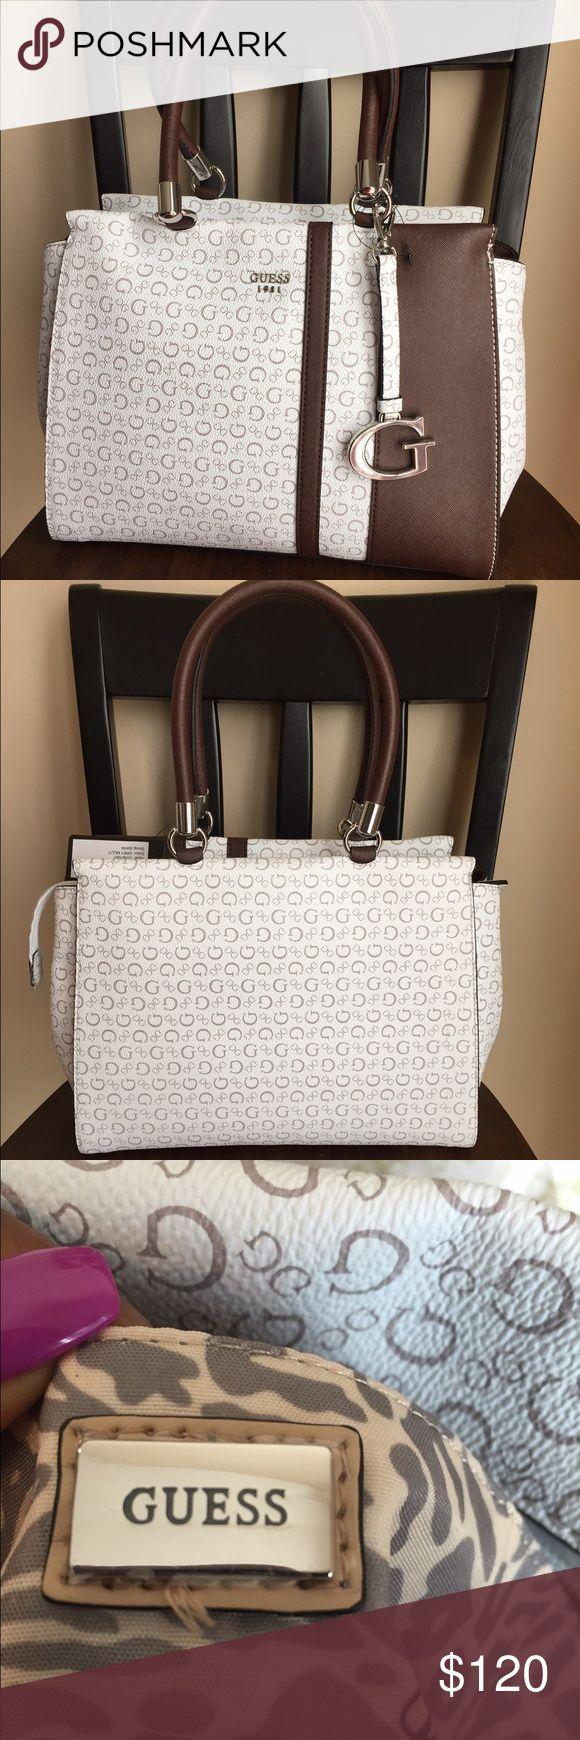 Guess handbag Beautiful chocolate and vanilla leather handbag with iconic guess symbol print. Guess Bags Satchels